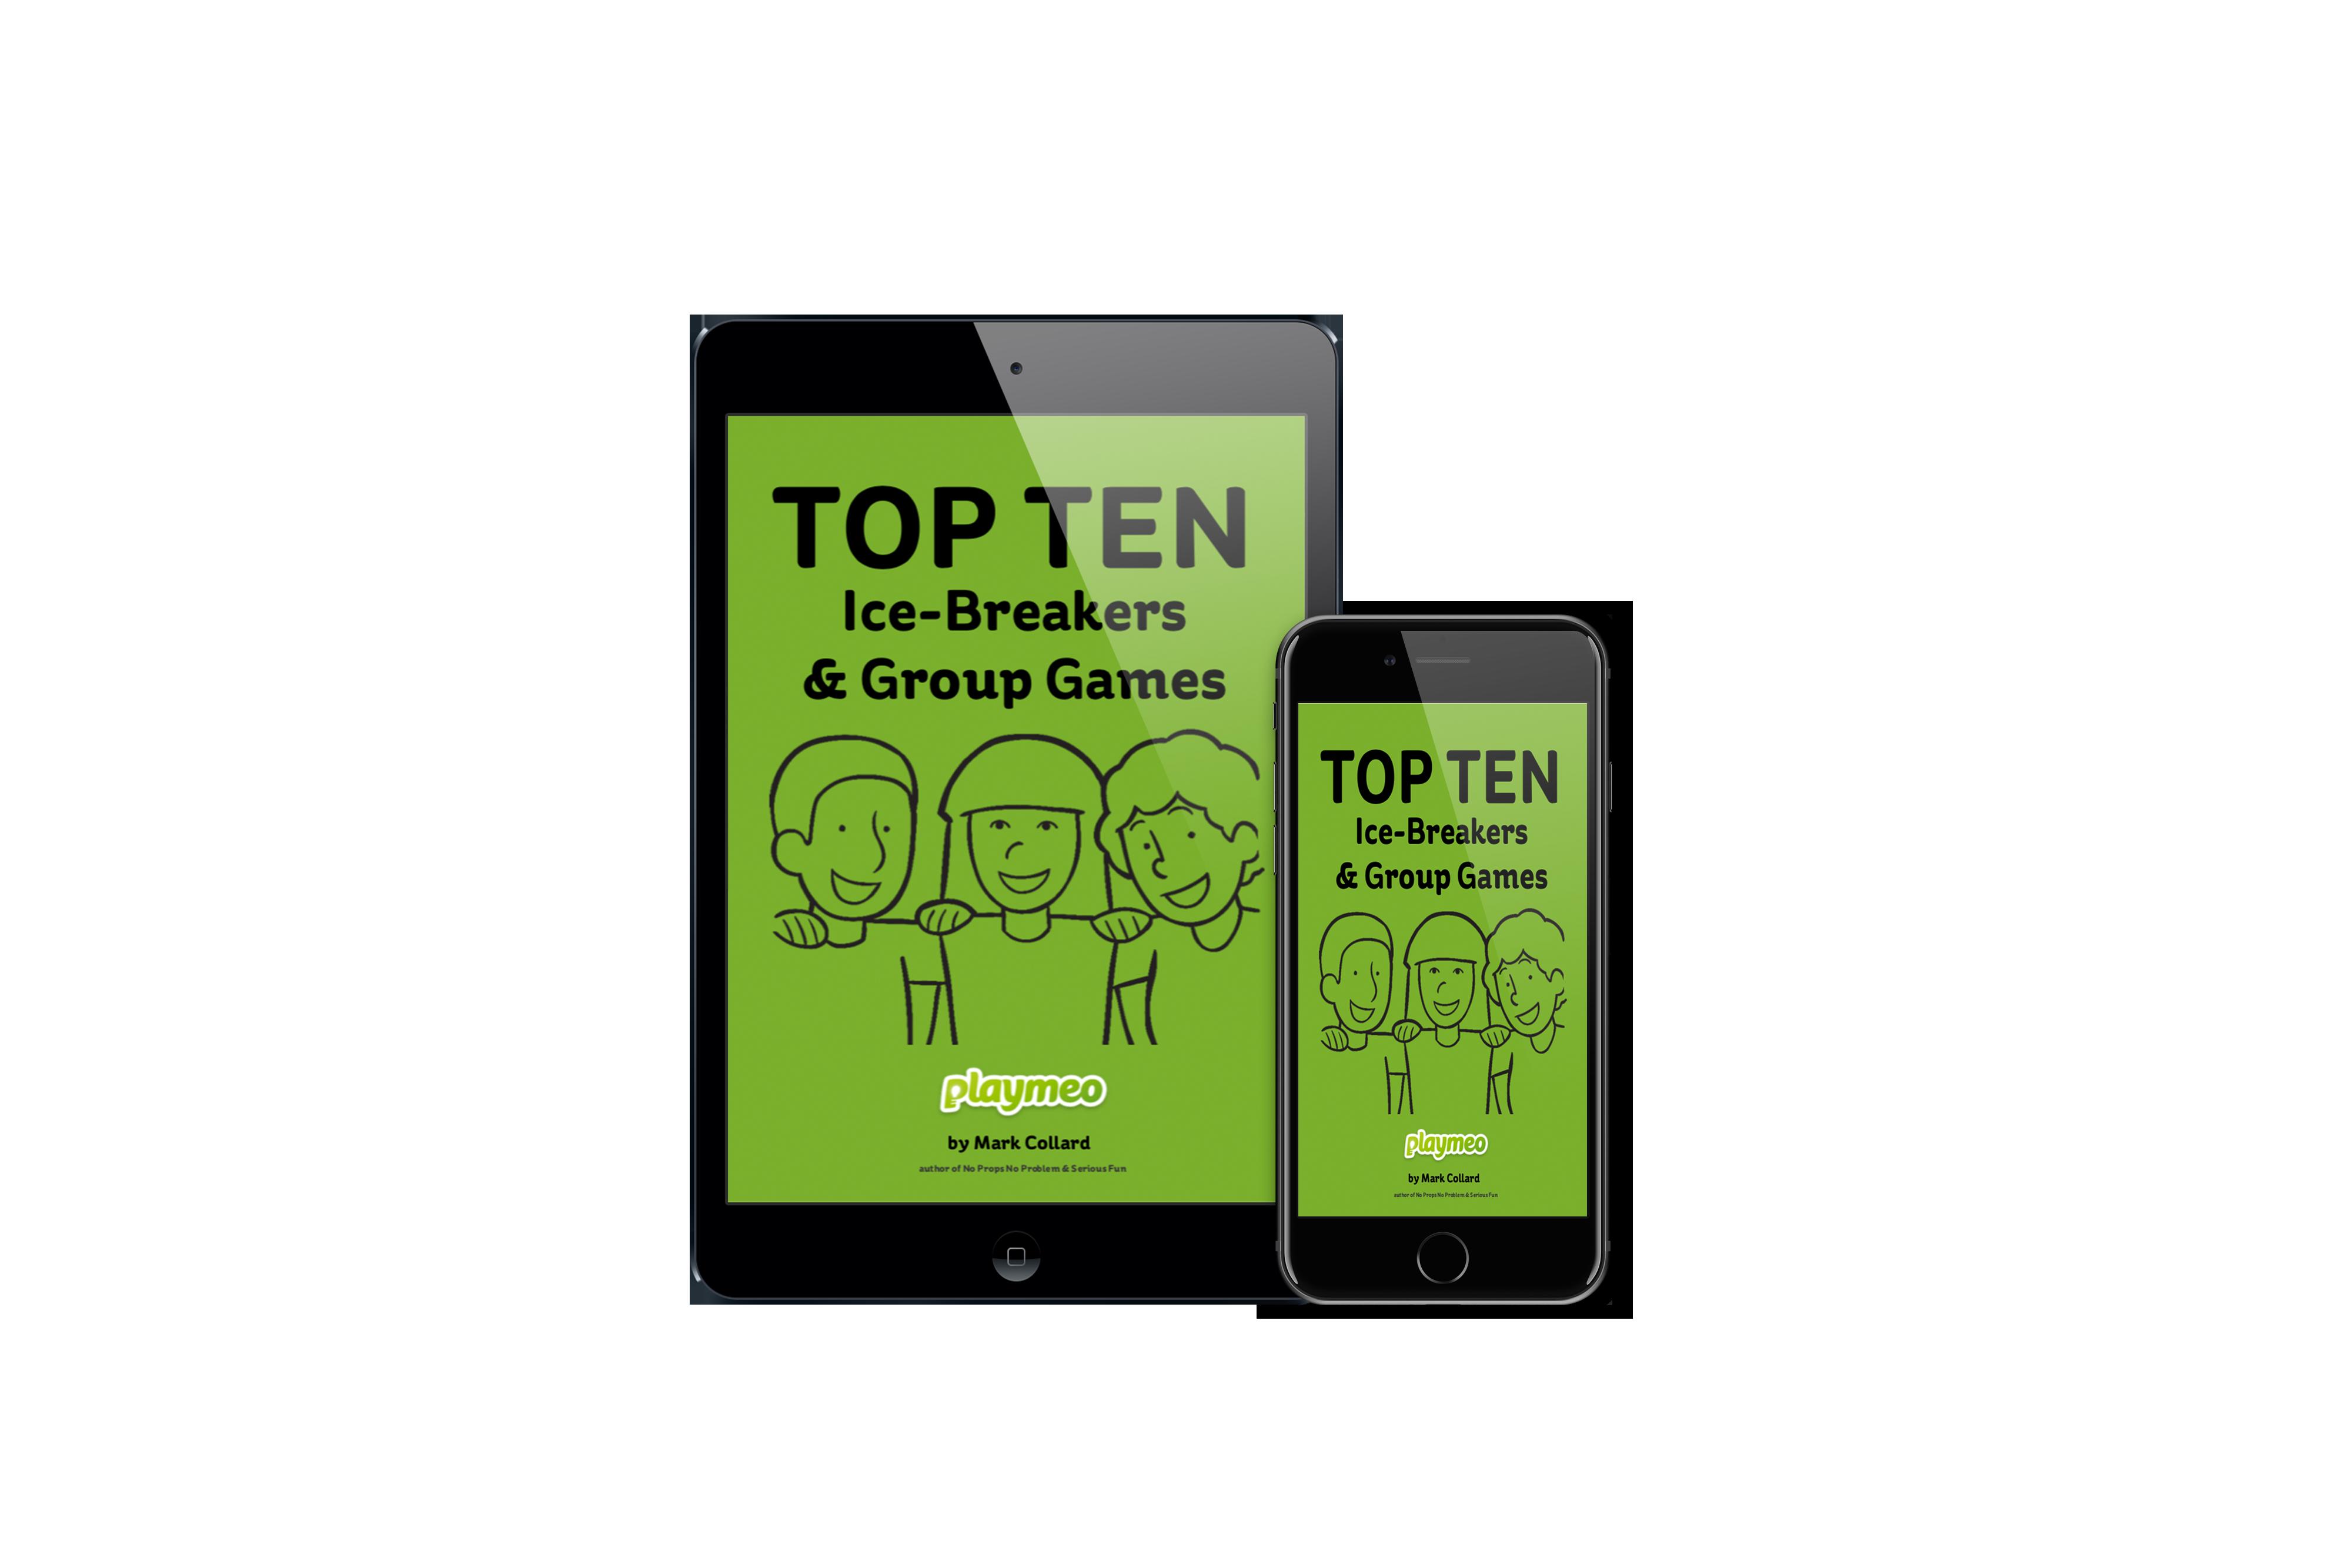 Top Ten Ice-Breakers & Group Games ebook by Mark Collard